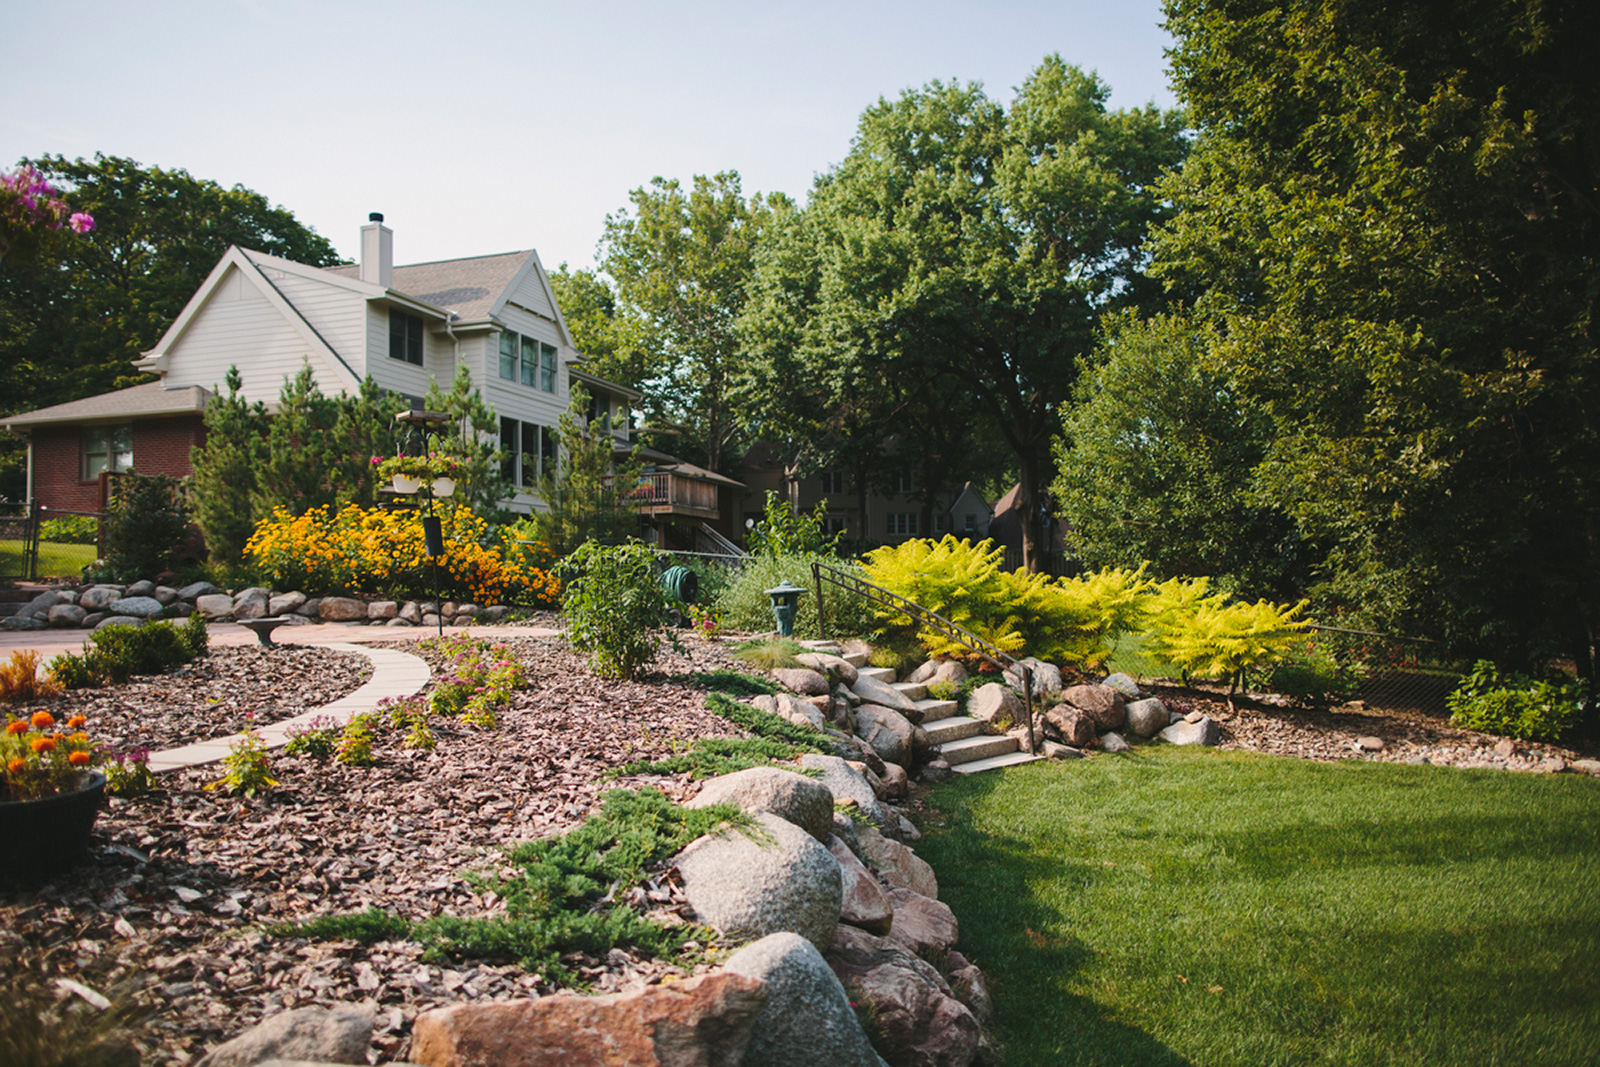 High Spring Landscaping Ideas Garden Ideas Houselogic Backyard Landscapes outdoor Great Backyard Landscaping